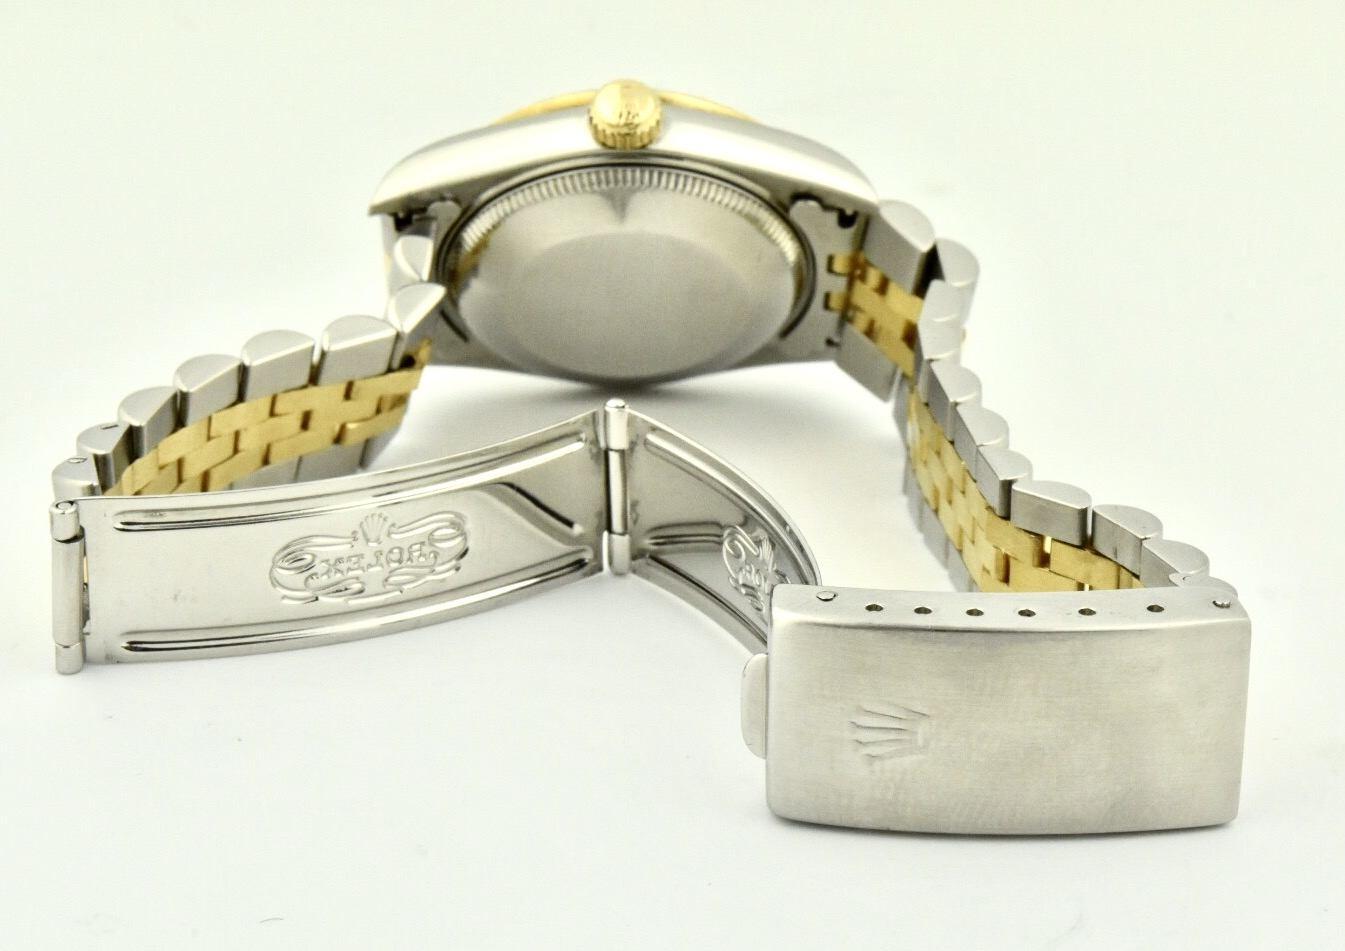 FullSizeRender 1 - Rolex Datejust Midsize